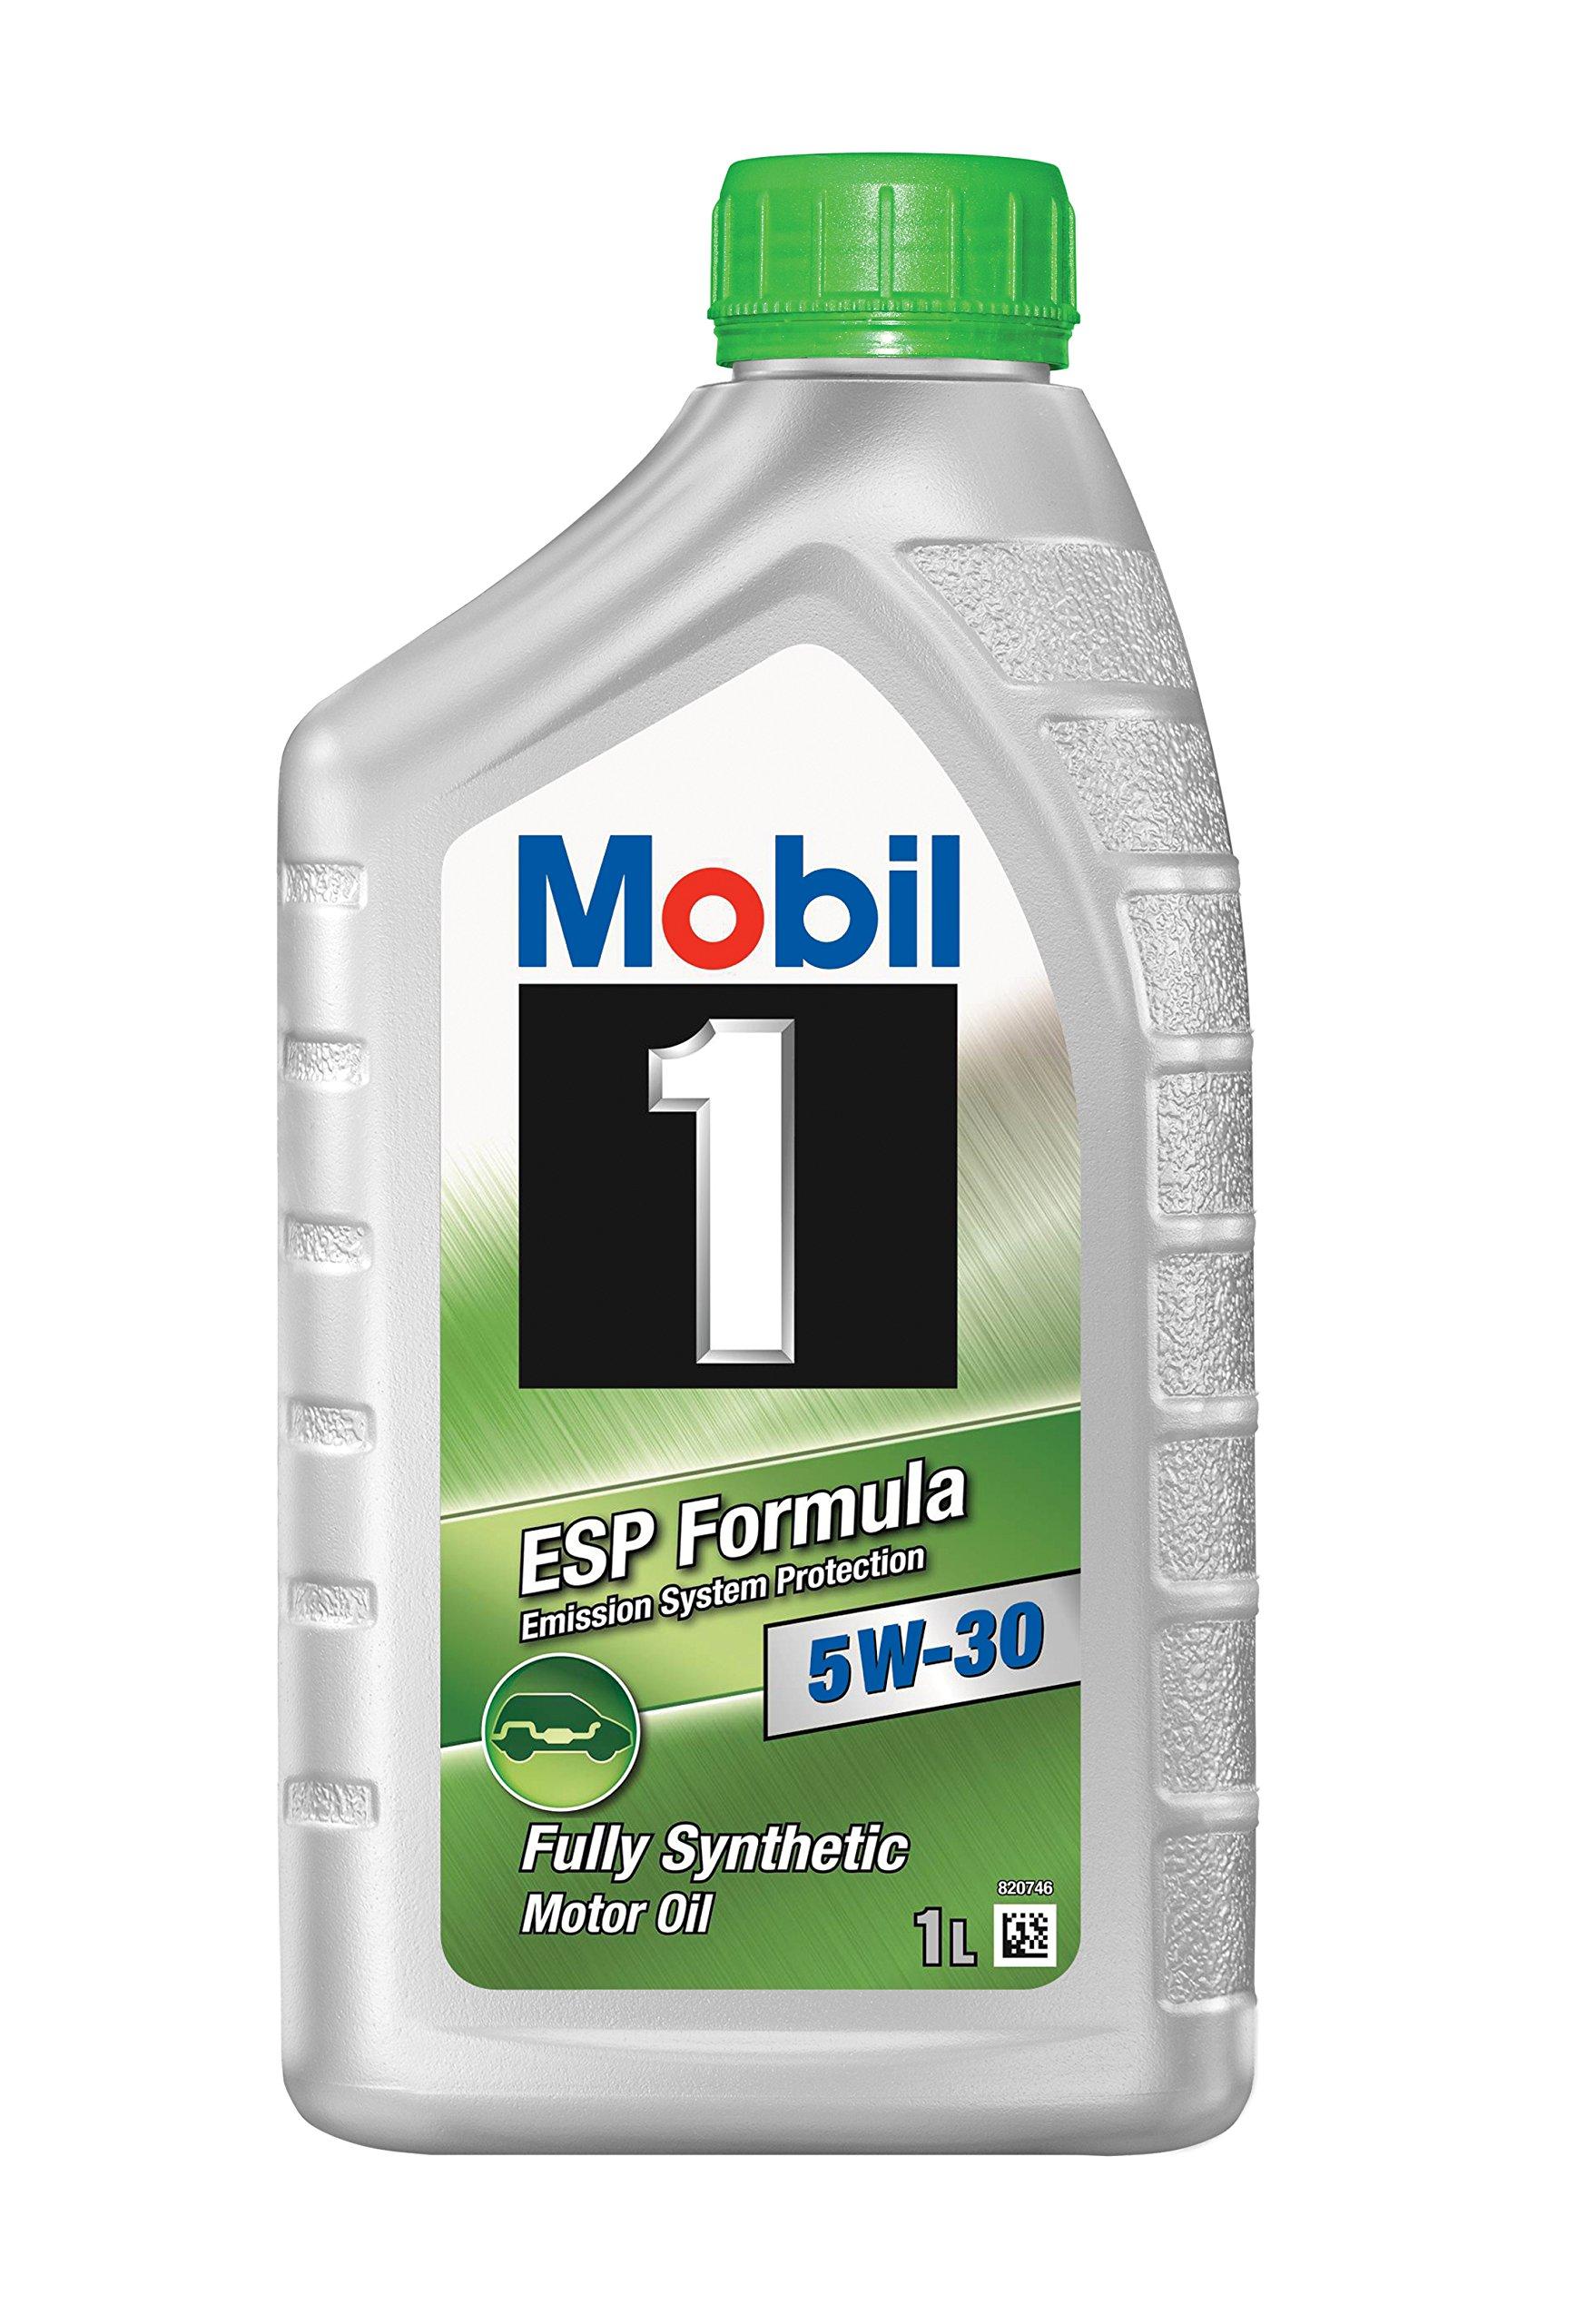 Mobil 1 (103469-12PK) ESP Formula 5W-30 Motor Oil - 1 Liter, (Pack of 12) by Mobil 1